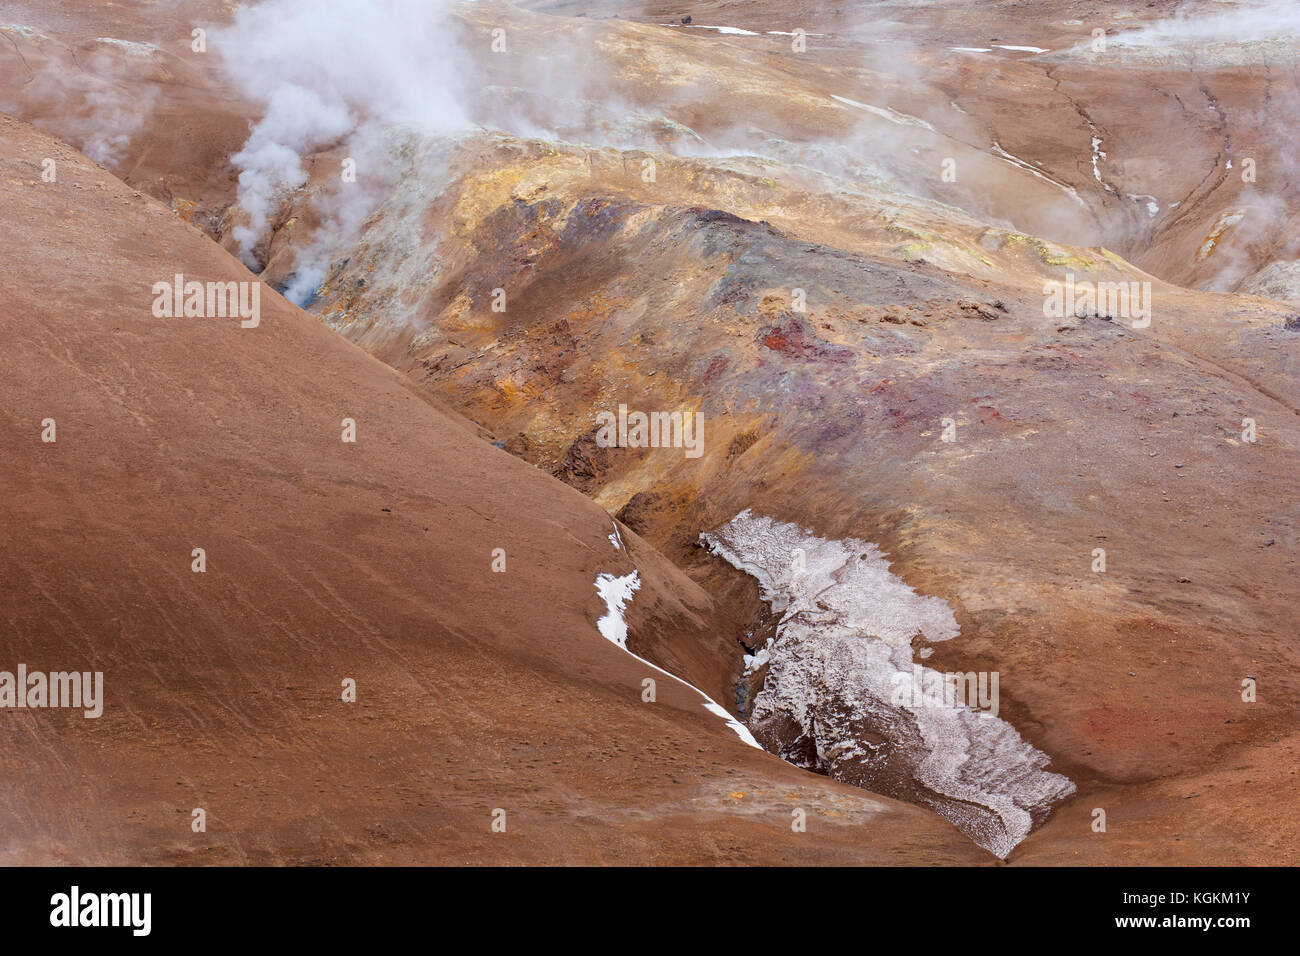 Hverir, geothermal area near Námafjall, Norðurland eystra / Nordurland eystra, Iceland - Stock Image